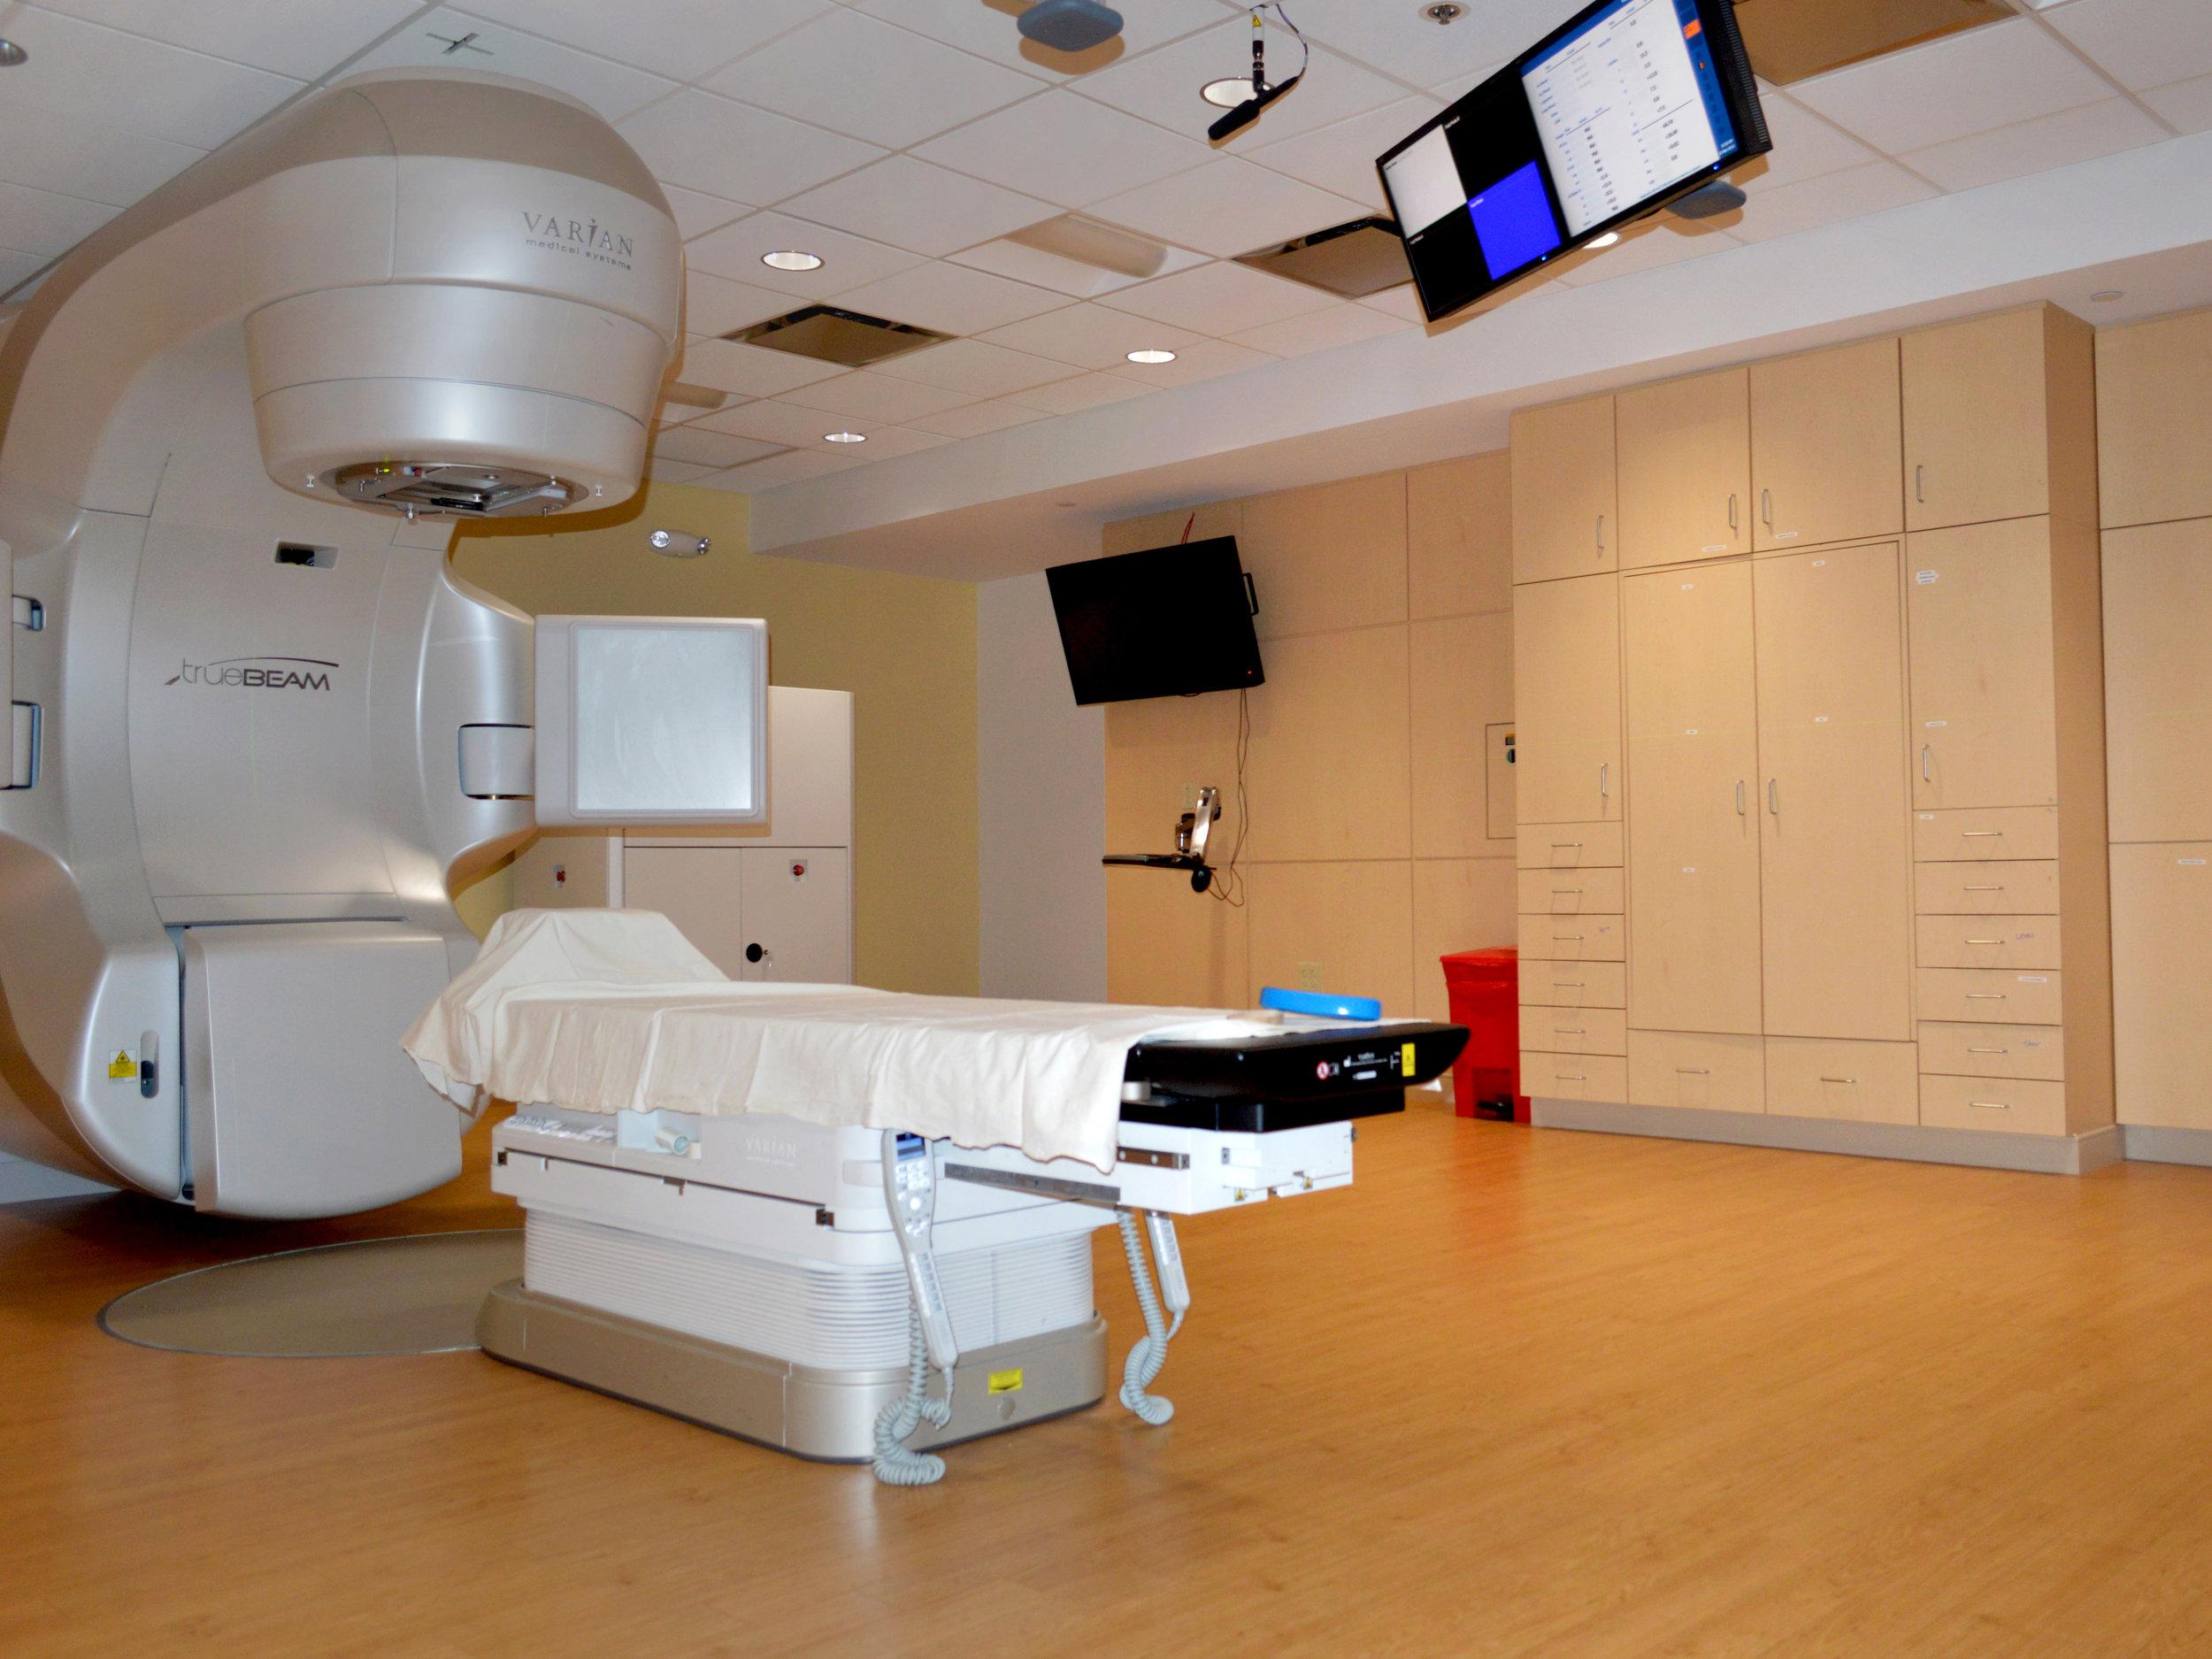 Siteman_Cancer_Center (5).JPG